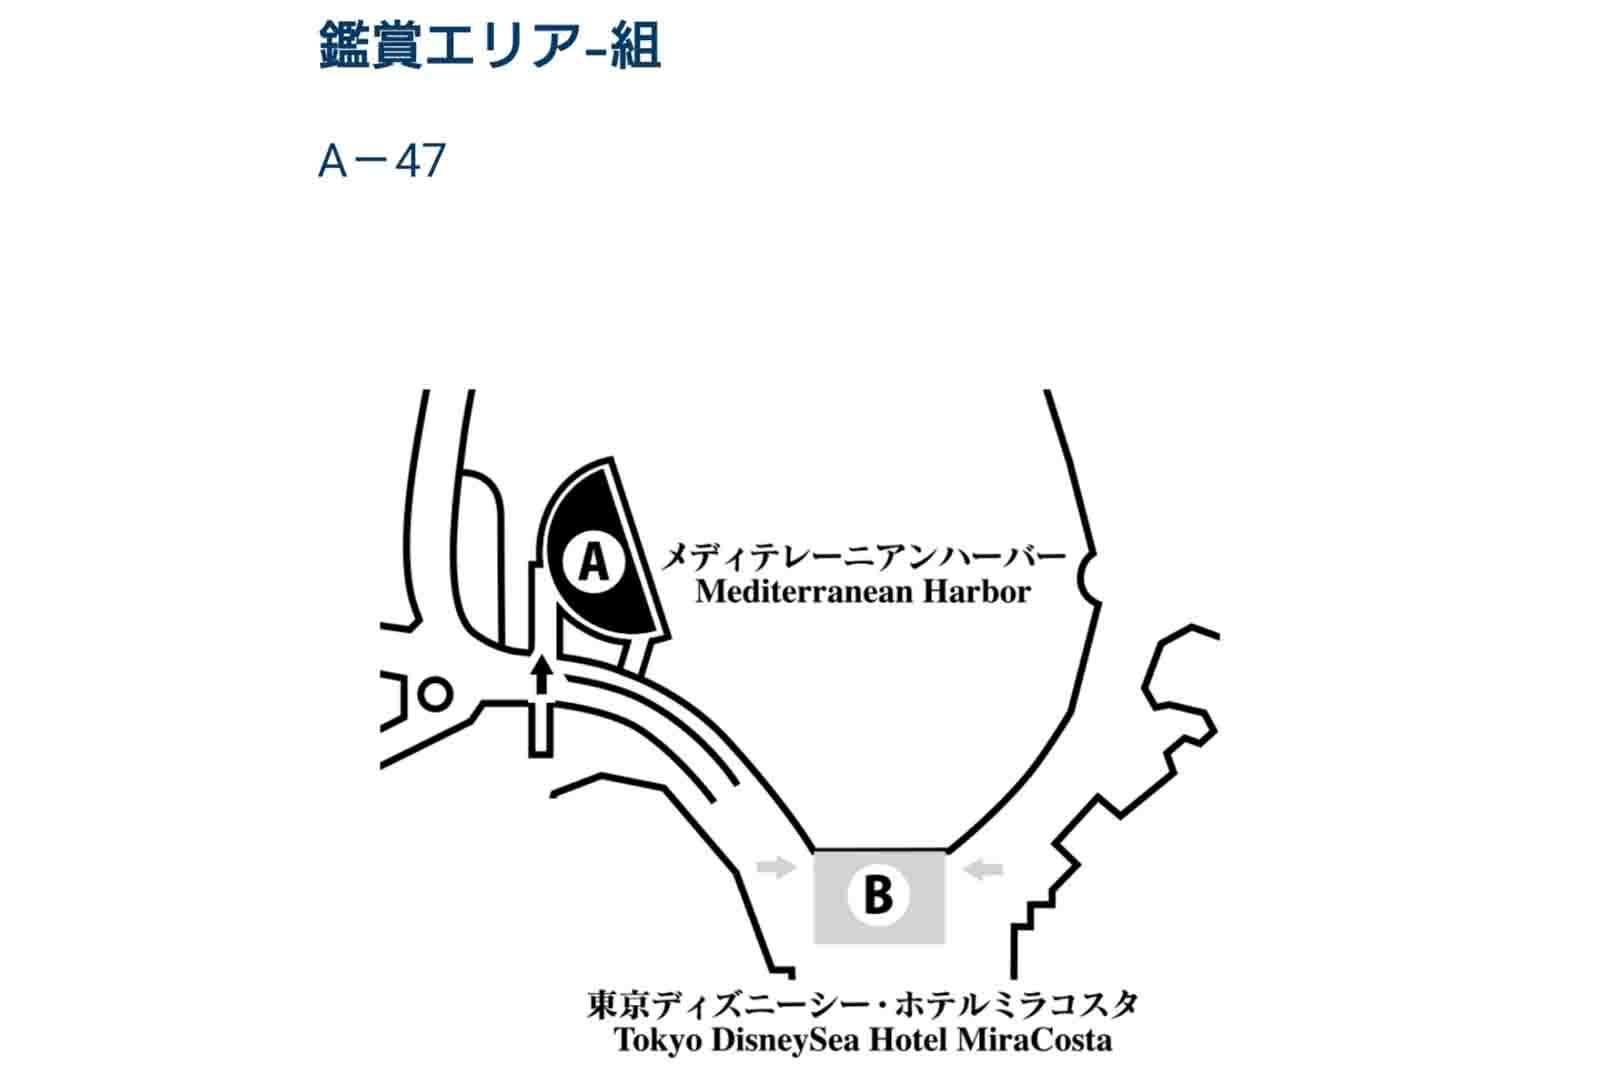 Tip-Top イースター 2019鑑賞場所ガイド